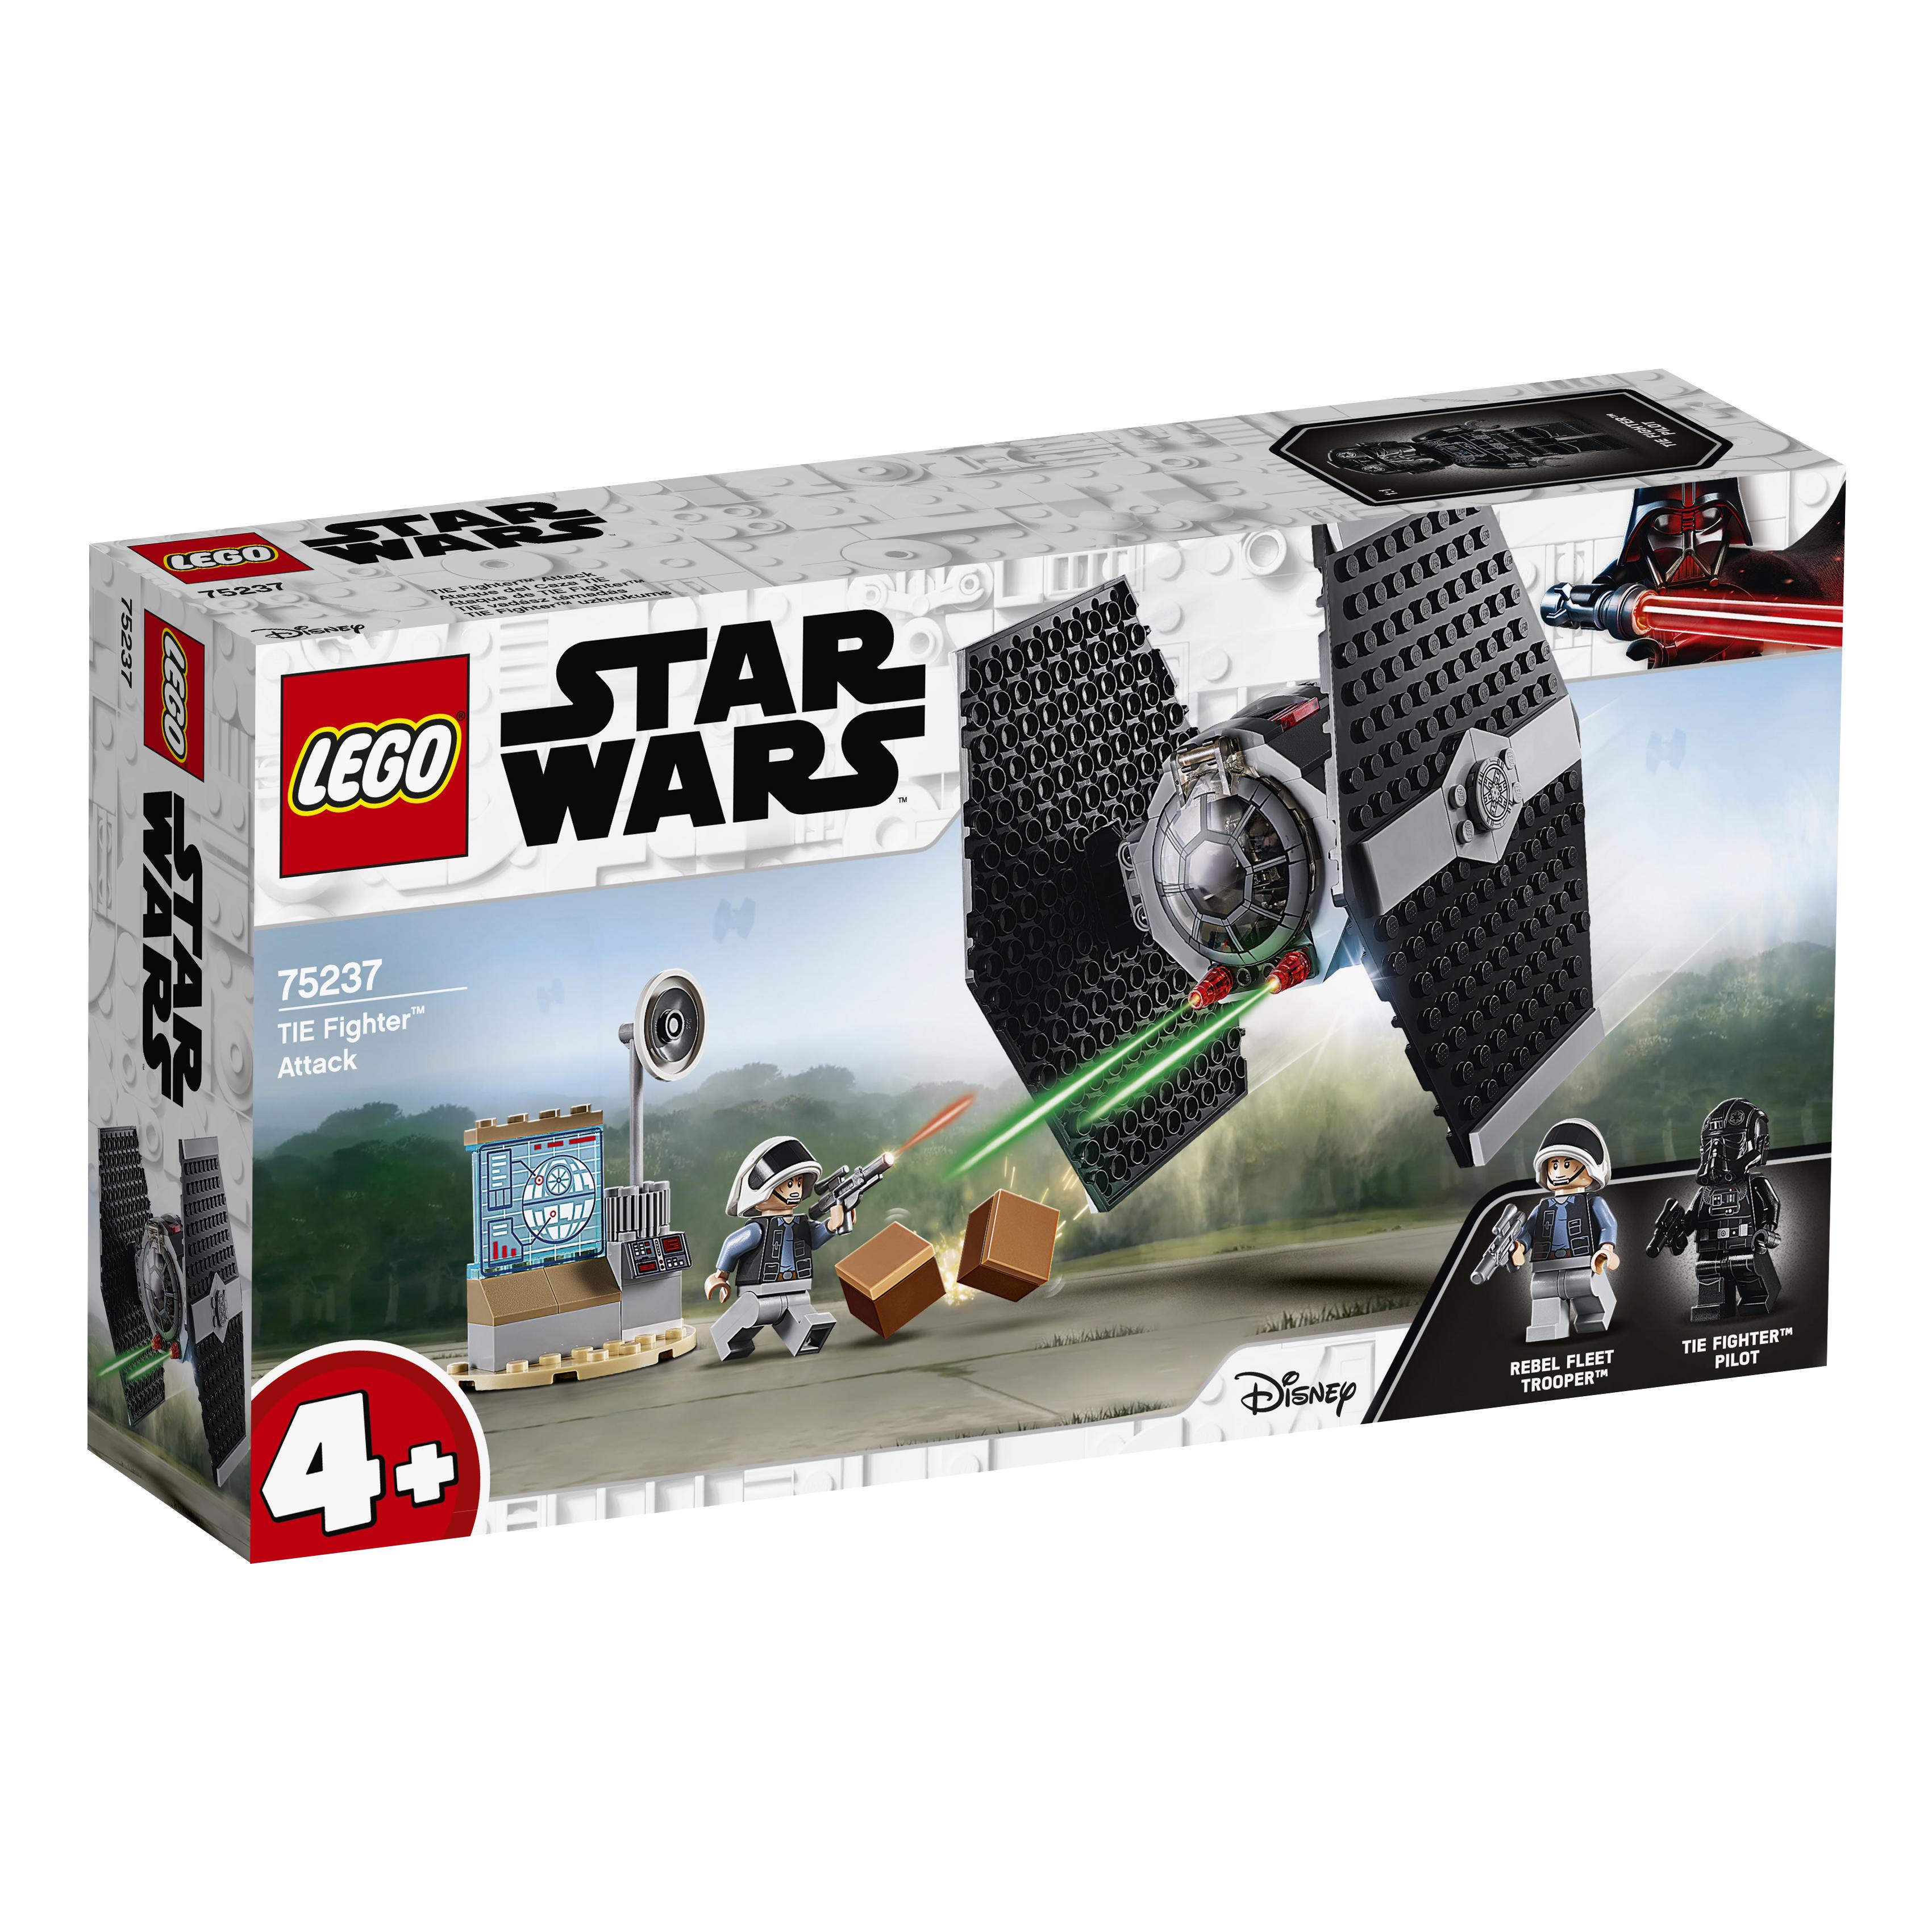 Конструктор LEGO Star Wars 75237 Истребитель СИД lego lego star wars 75092 истребитель набу™ naboo starfighter™